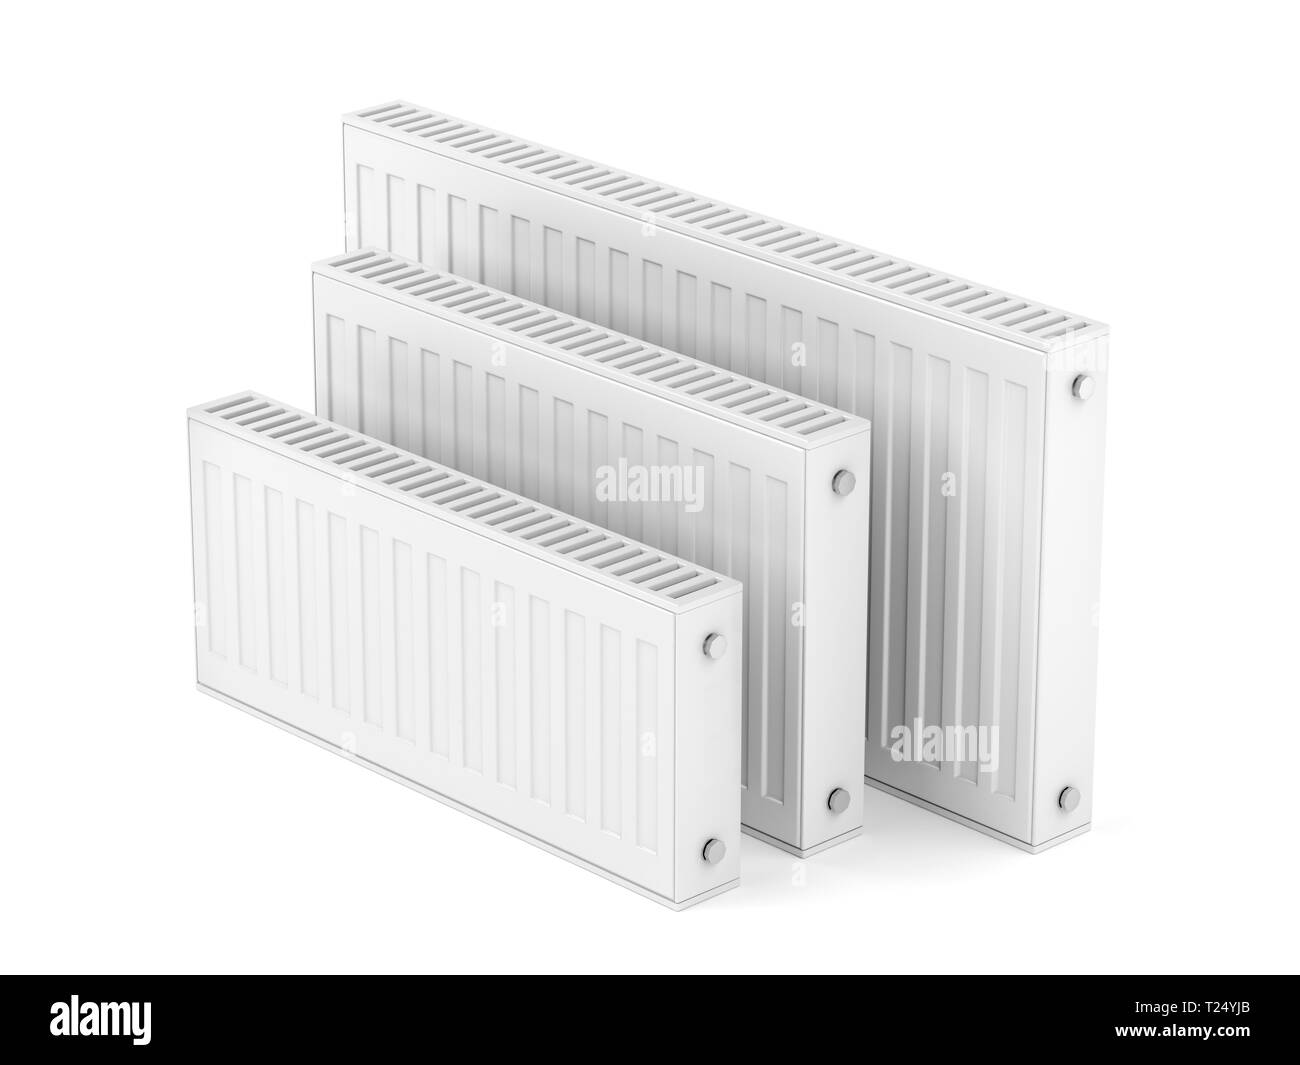 Radiator Black and White Stock Photos & Images - Alamy